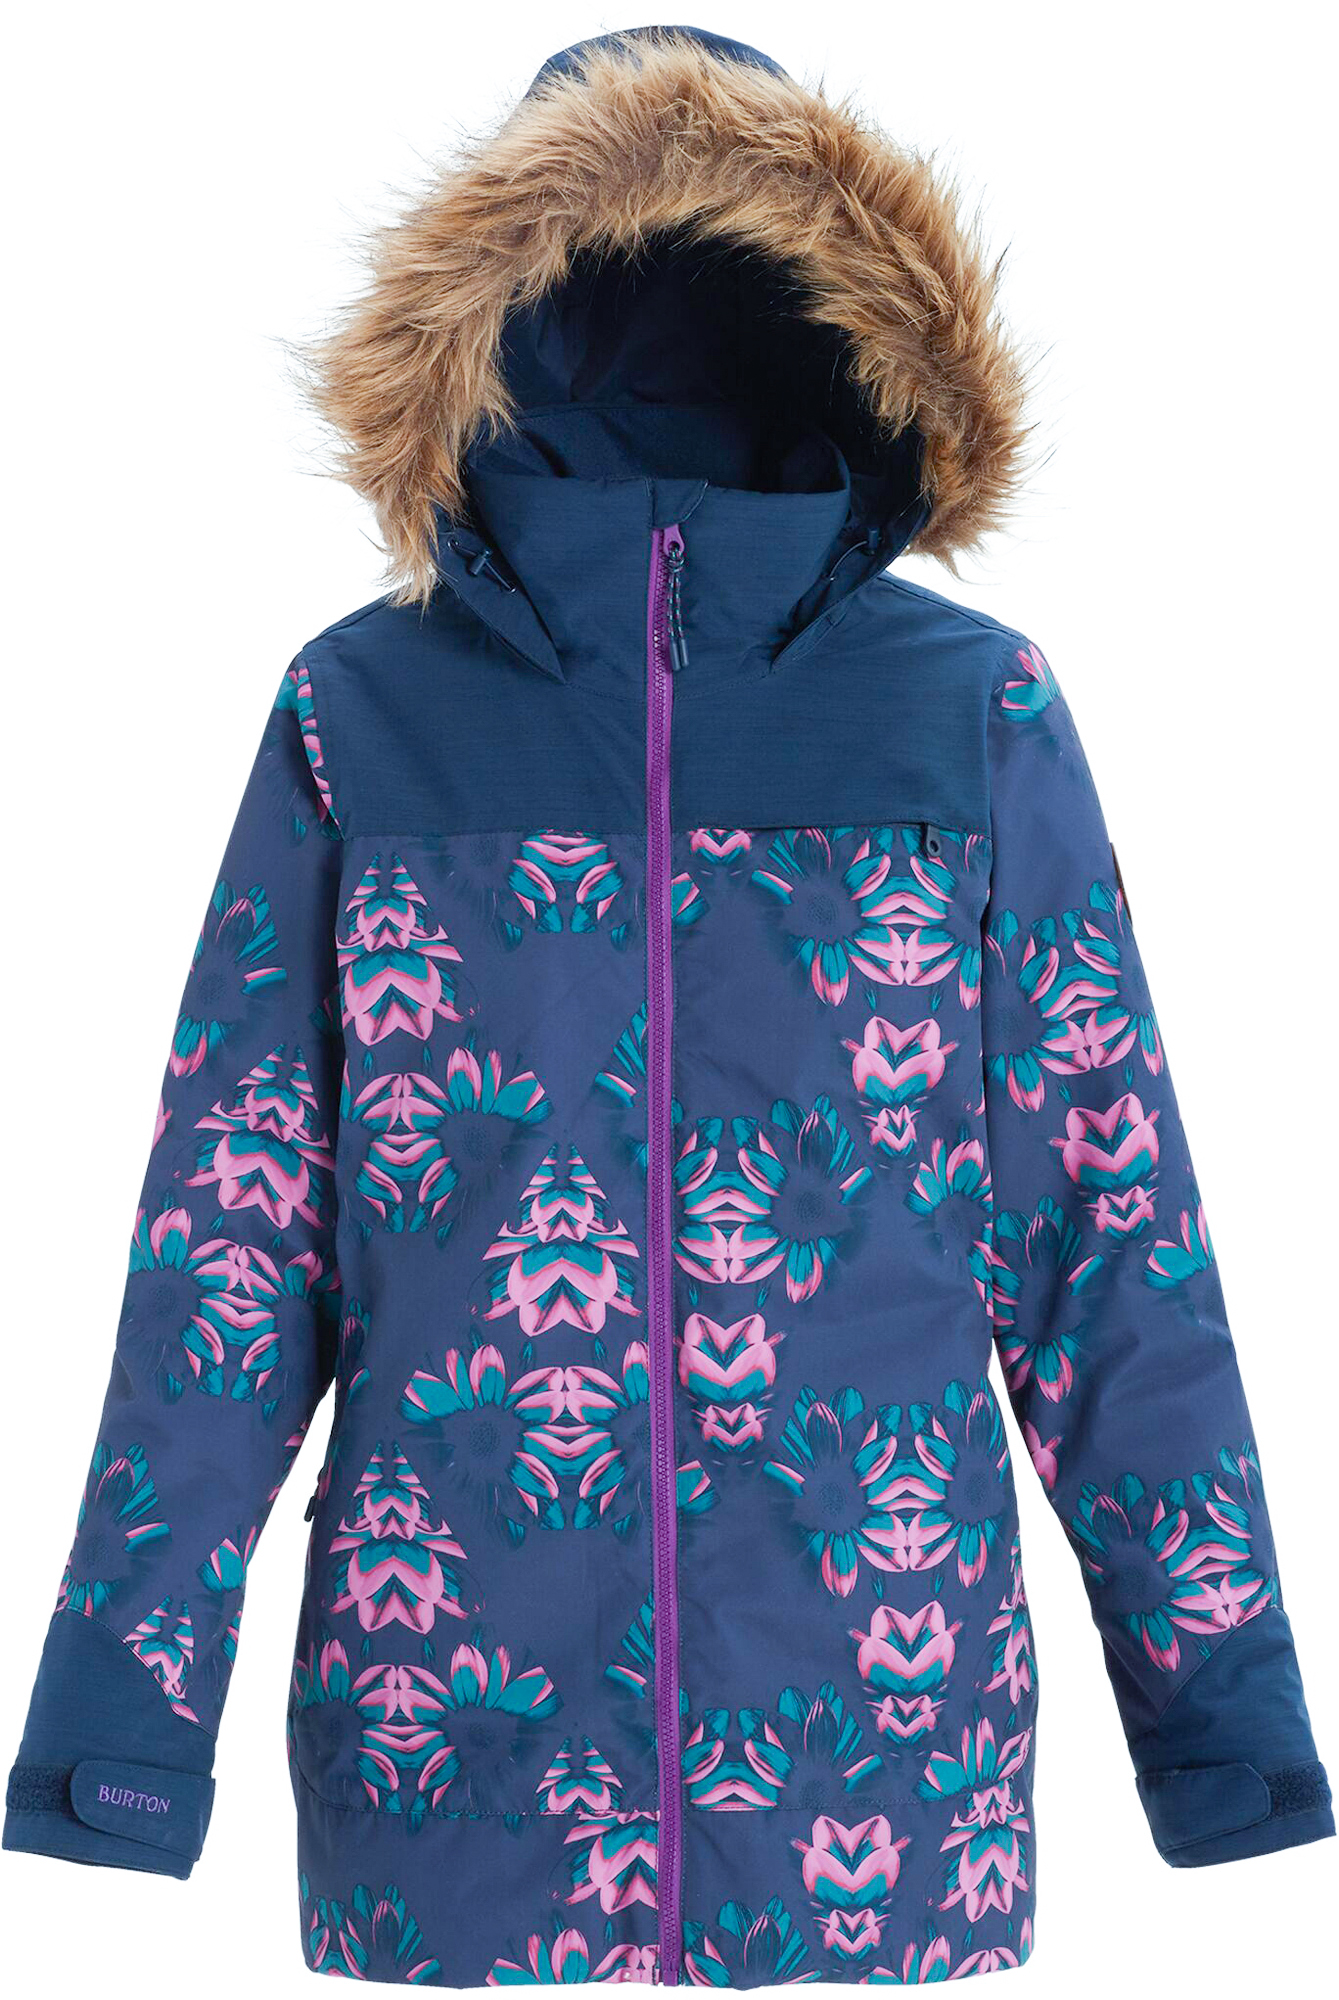 цена на Burton Куртка утепленная женская Burton Lelah, размер 42-44